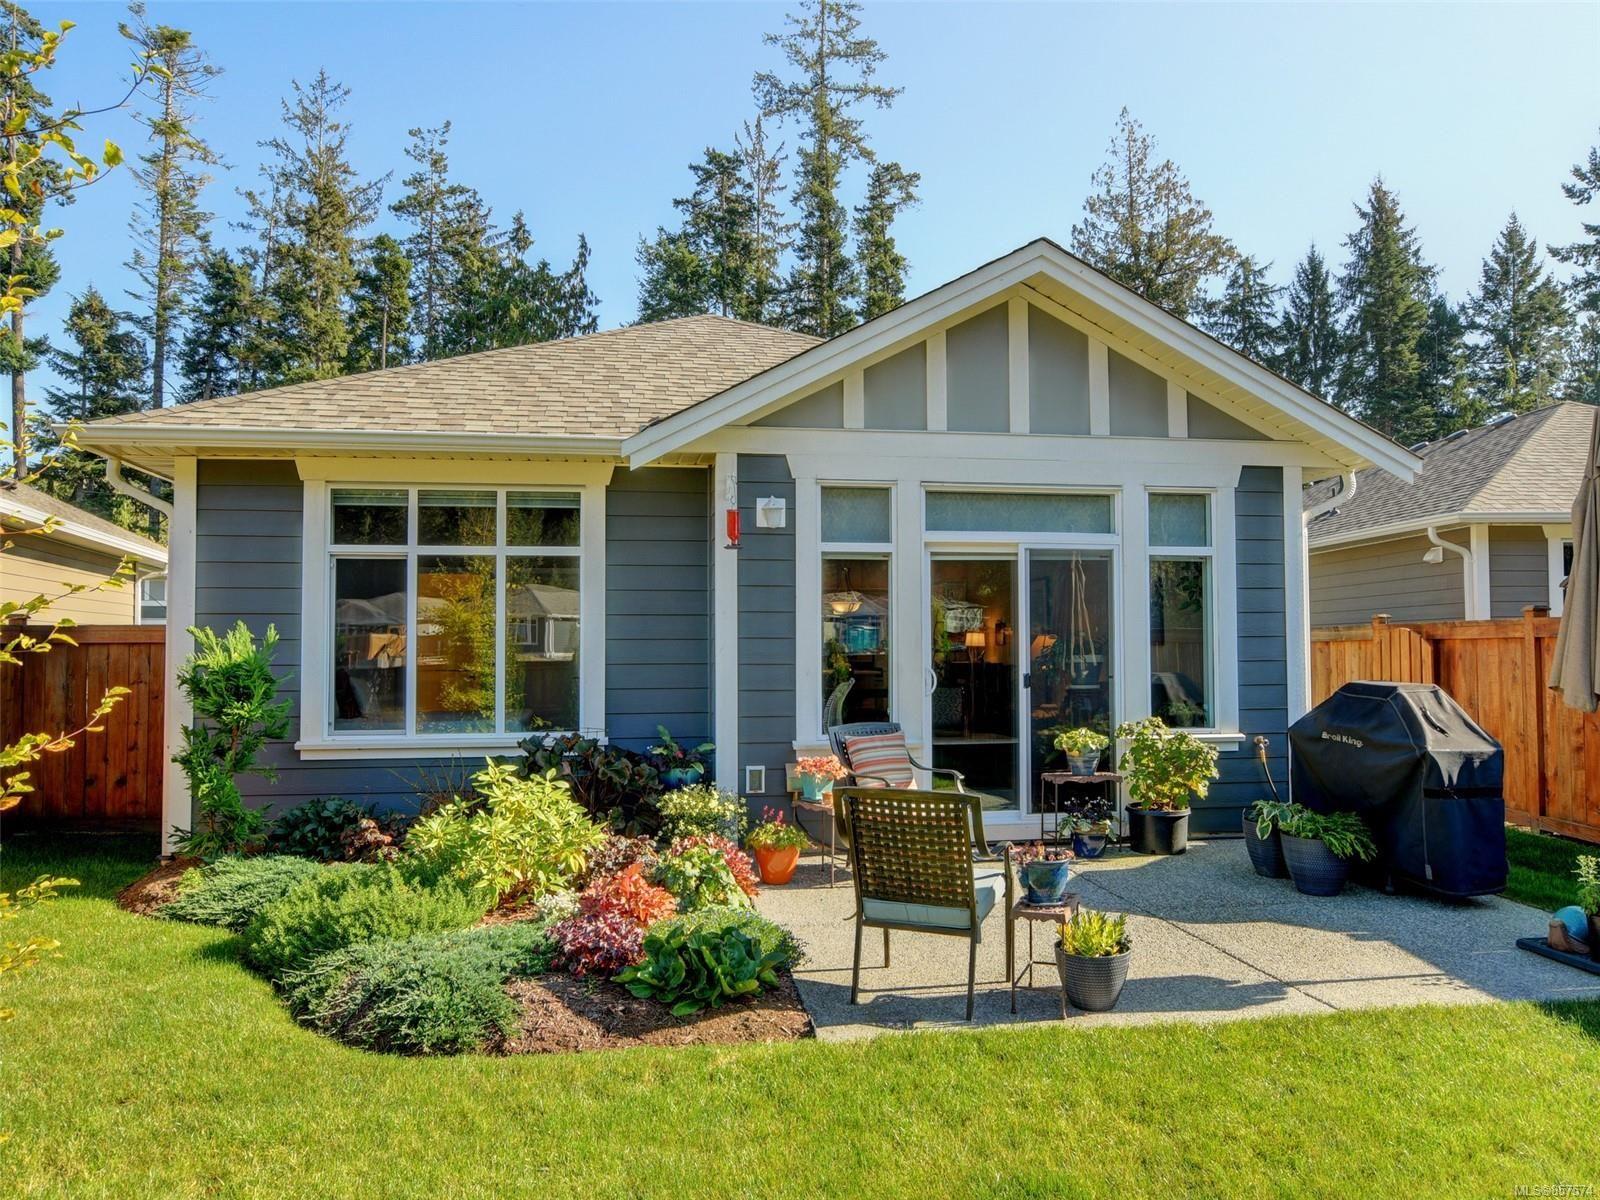 Photo 21: Photos: 6376 Shambrook Dr in : Sk Sunriver House for sale (Sooke)  : MLS®# 857574